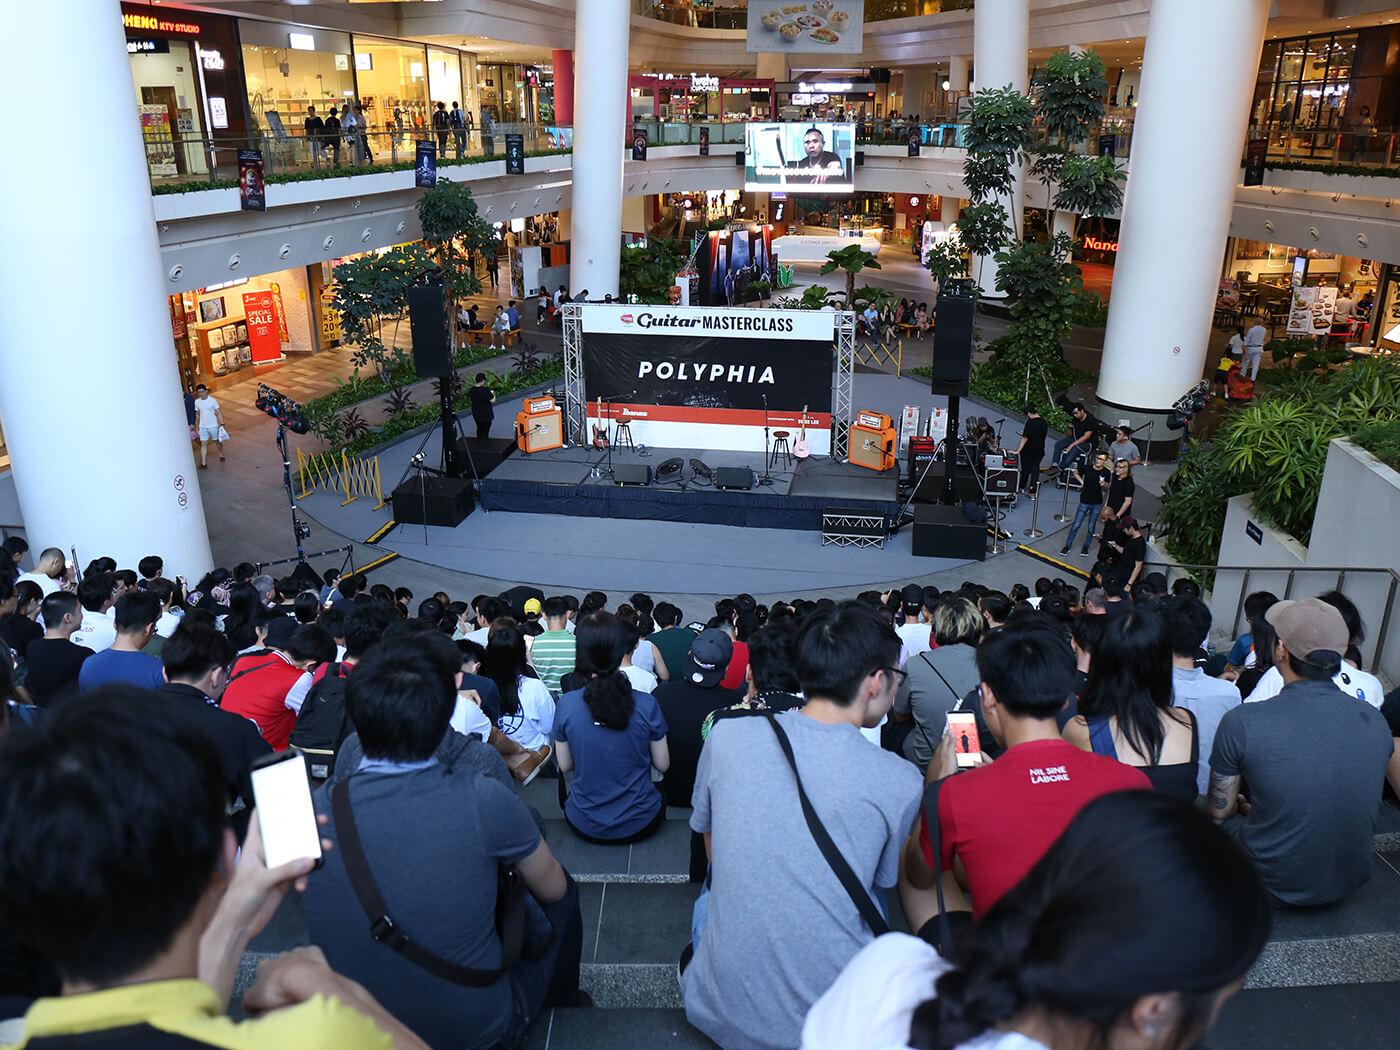 Polyphia (Crowd)